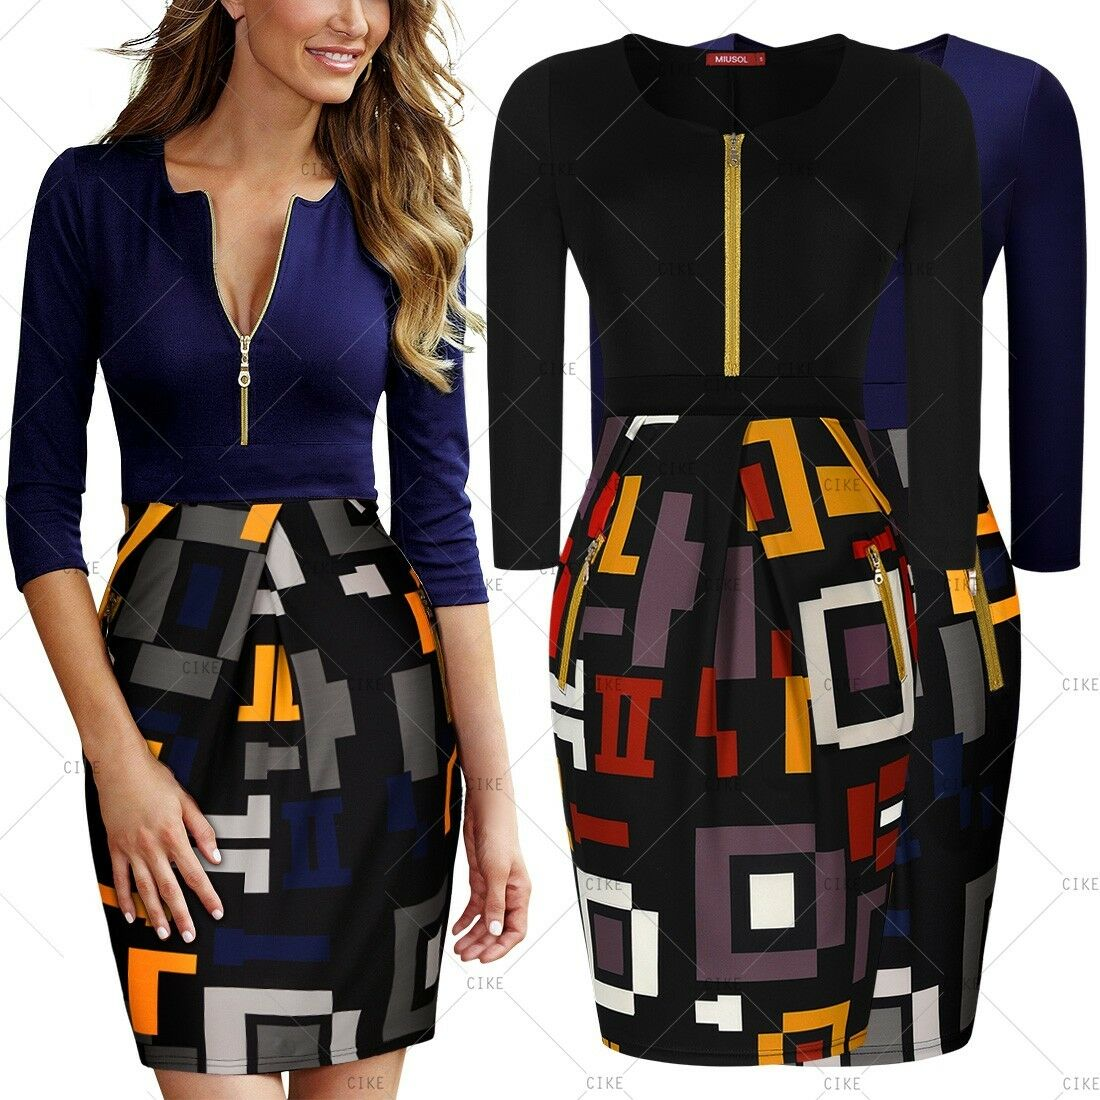 MIUSOL Women/'s Vintage Style Belted Retro Dresses Size XL RRP£59.99 401